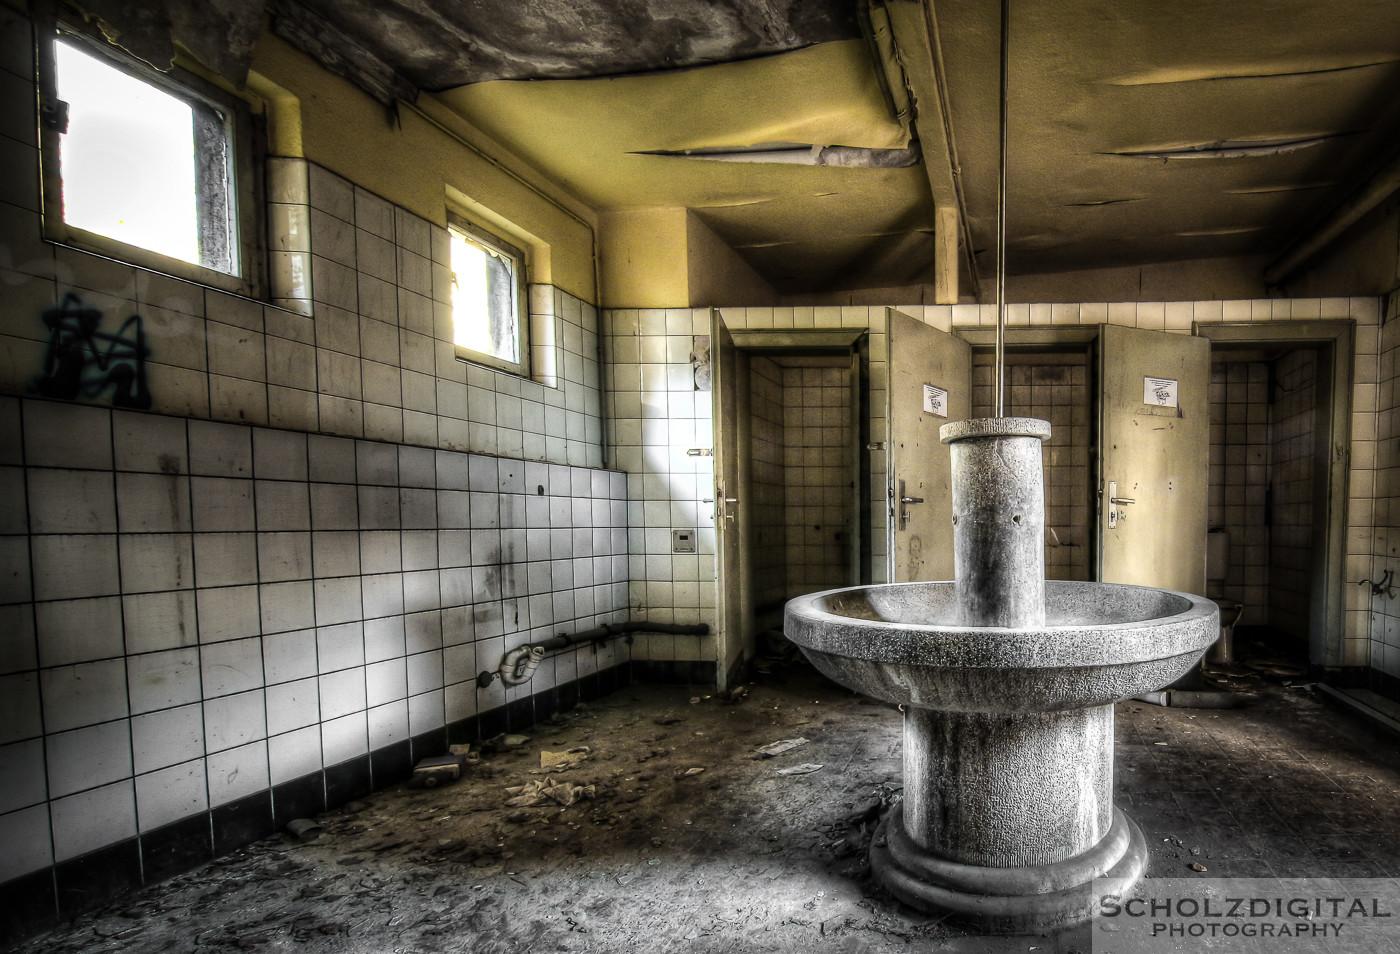 Urbex, Lost Place, HDR, Abandoned, verlassene Orte, verlassen, verlaten, Urban exploration, UE, Verlassene Orte in Deutschland, Rhein Emscher Armaturen